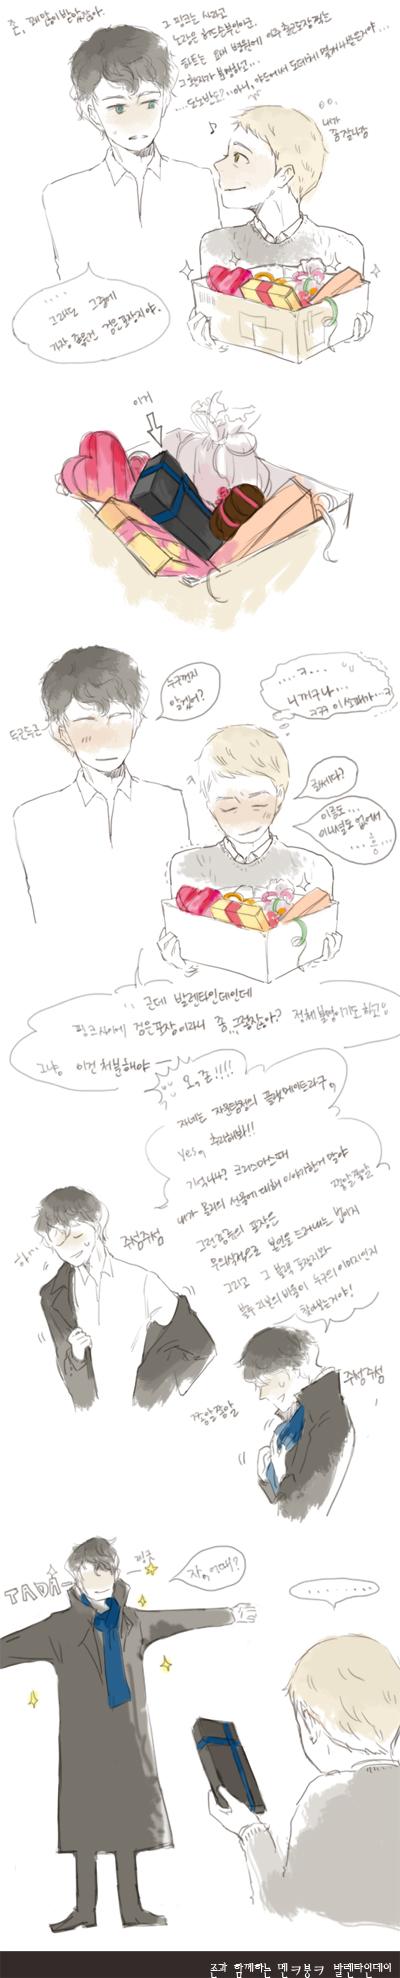 Valentines doodle by imwhooo